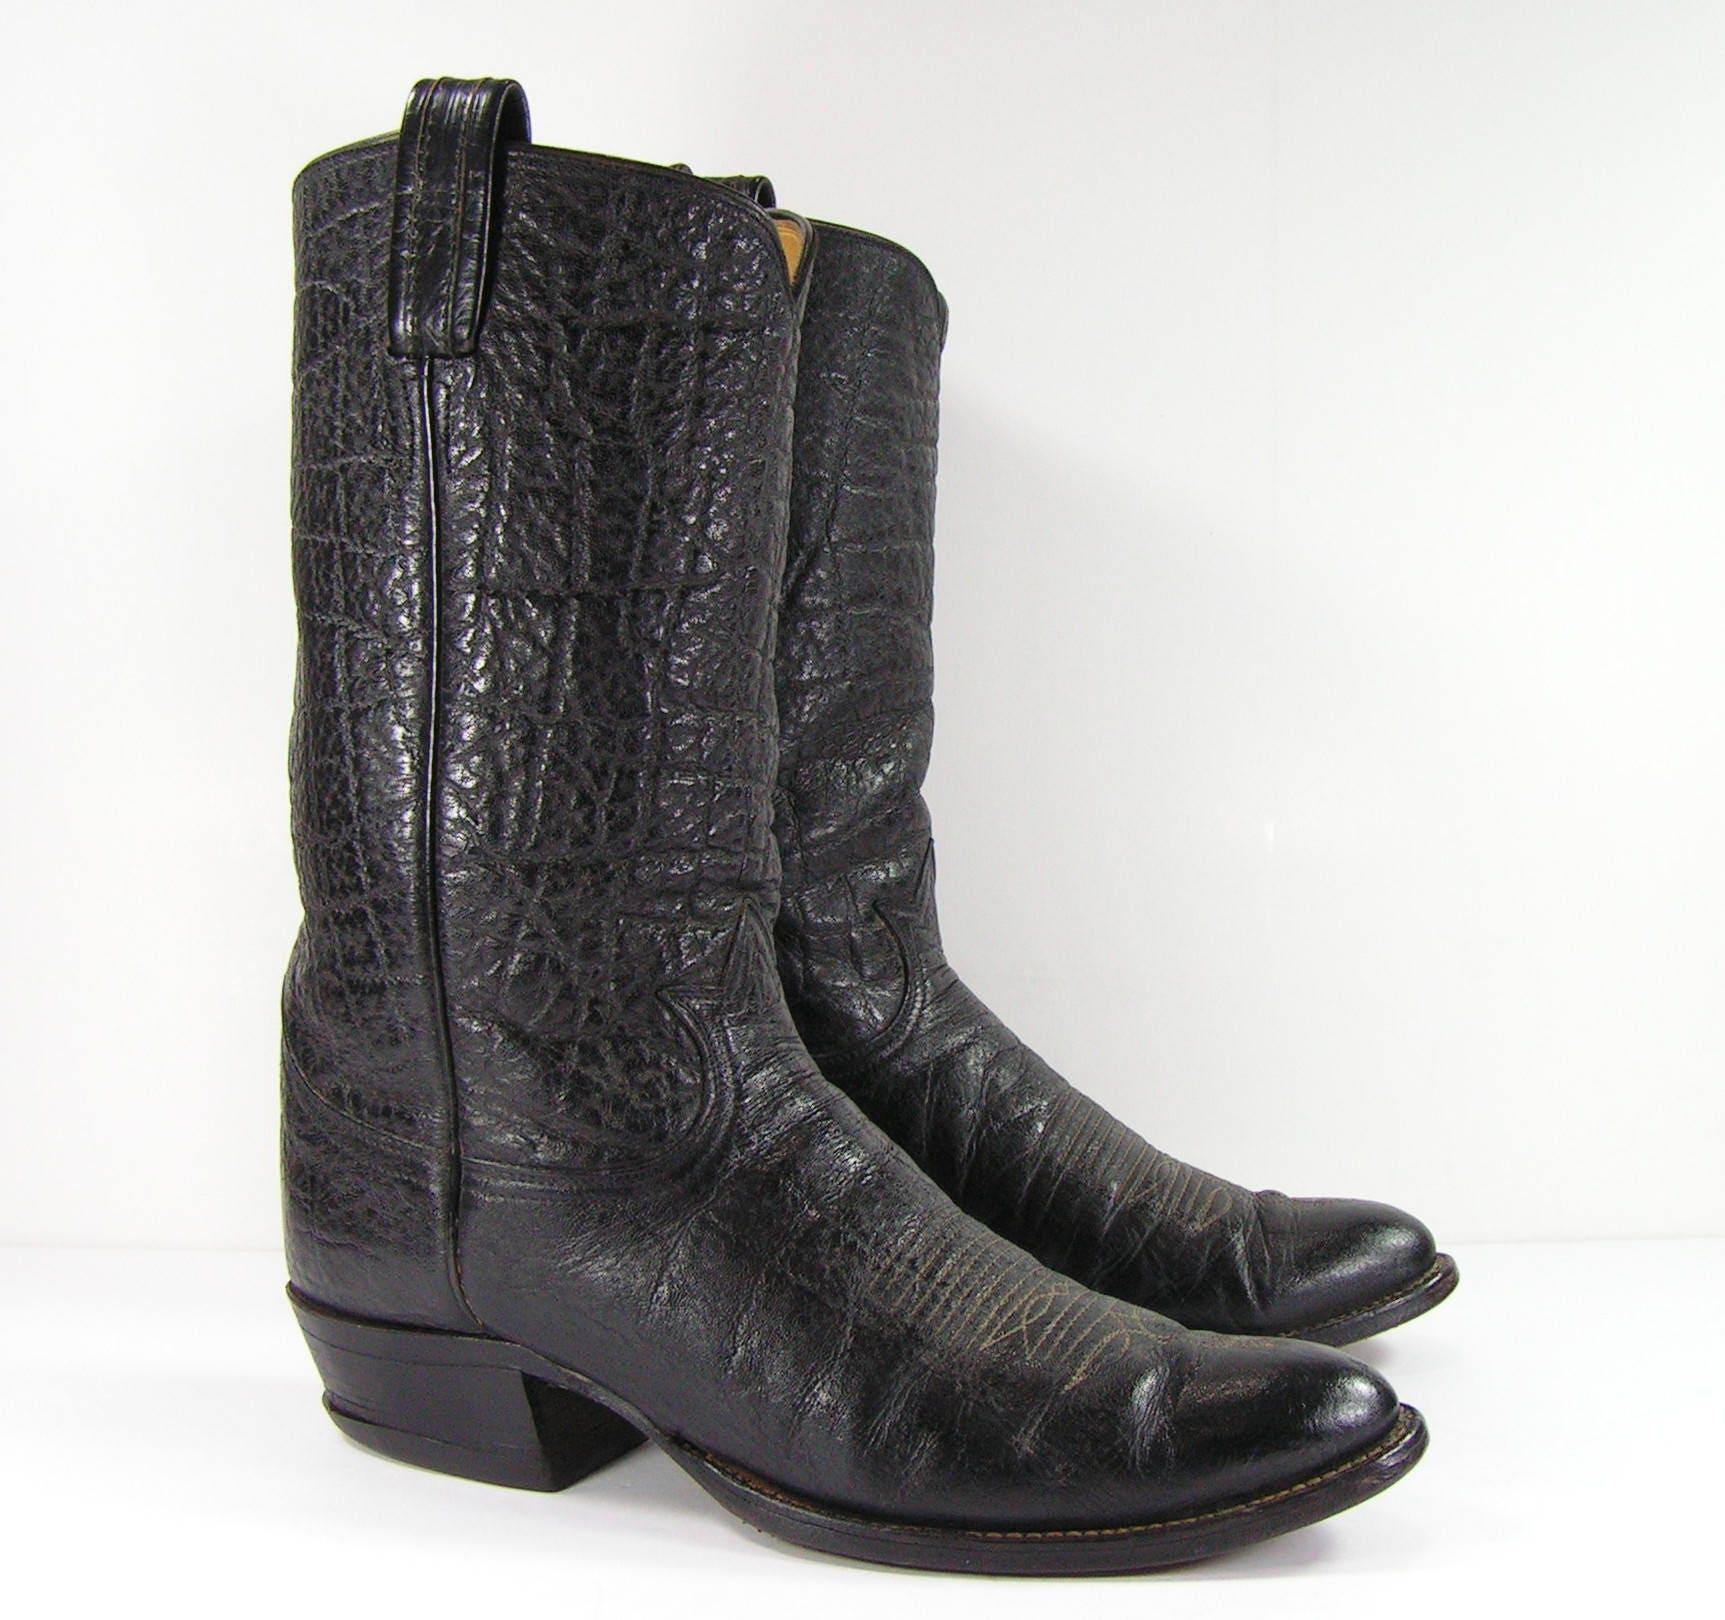 0071b6560e0 vintage tony lama cowboy boots mens 10.5 D black western leather biker farm  black label